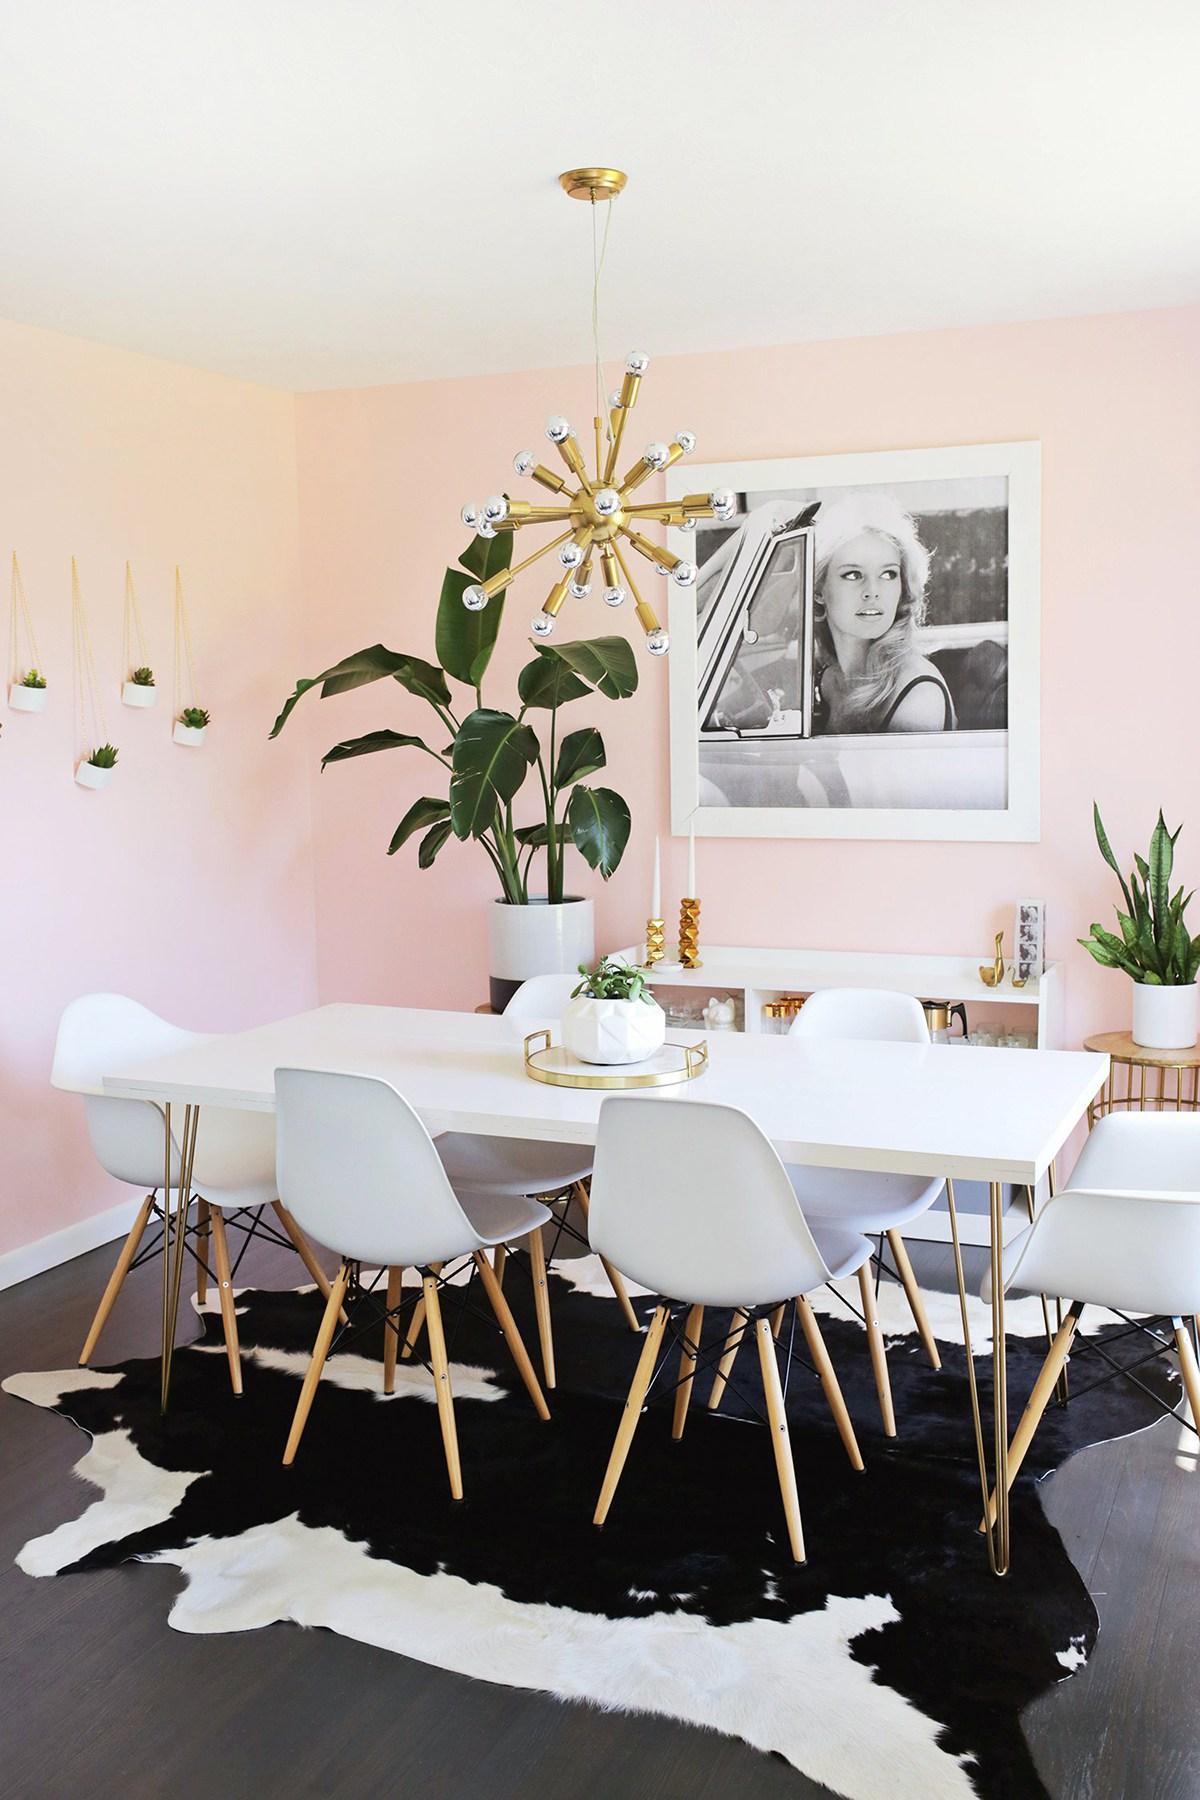 boho chic 25 Boho Chic Dining Room Designs That Will Inspire You 25 boho chic dining room designs that will inspire you 1